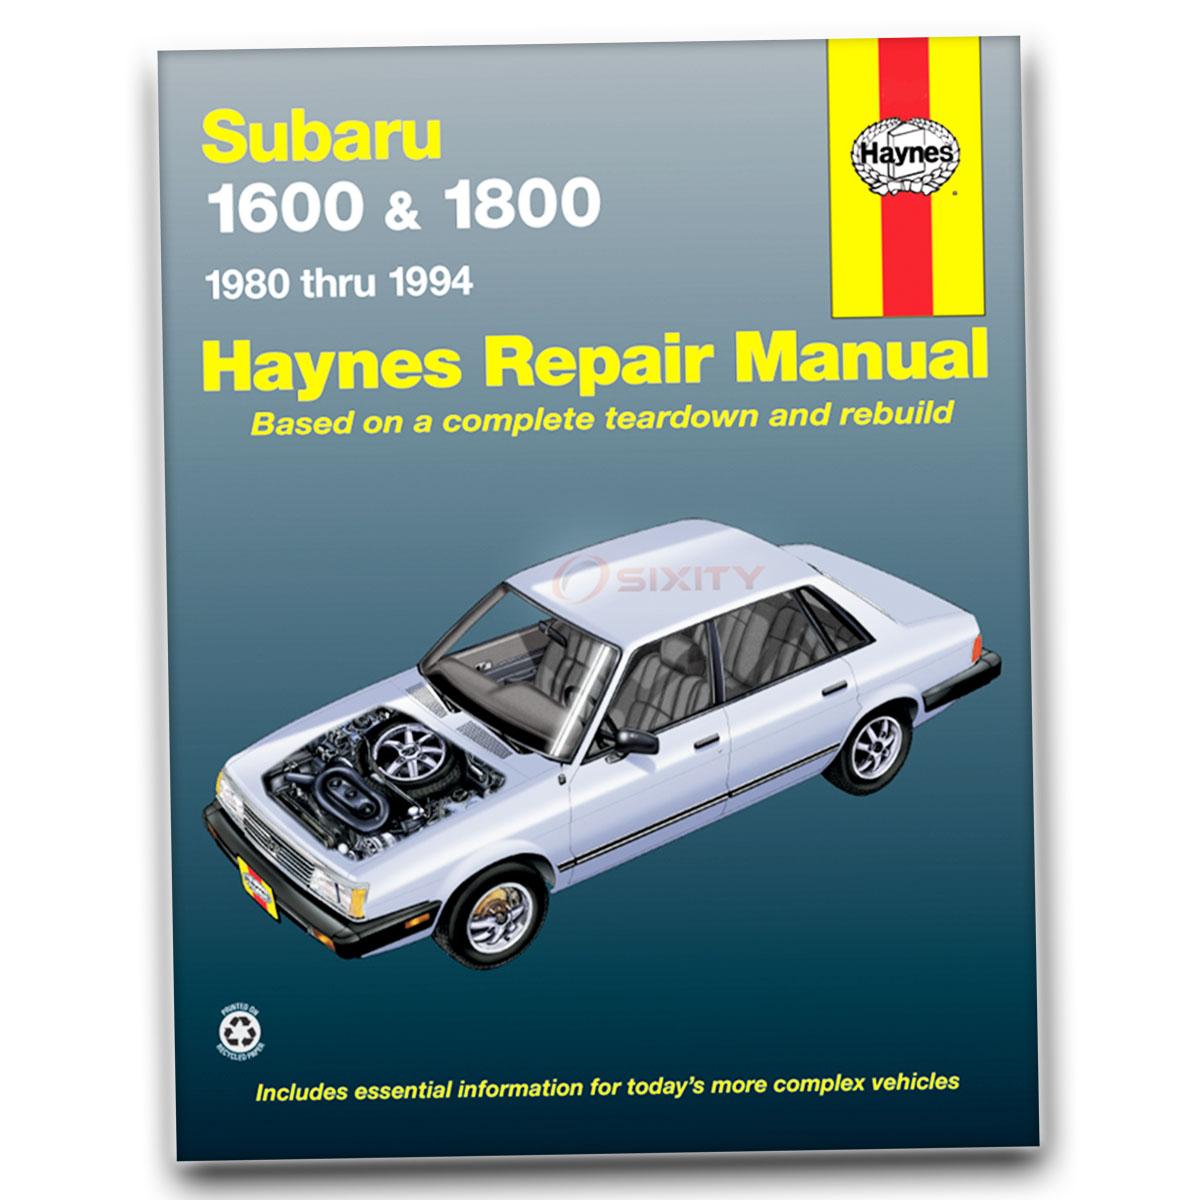 Haynes Repair Manual for Subaru XT DL GL-10 Turbo Shop Service Garage Book  zz